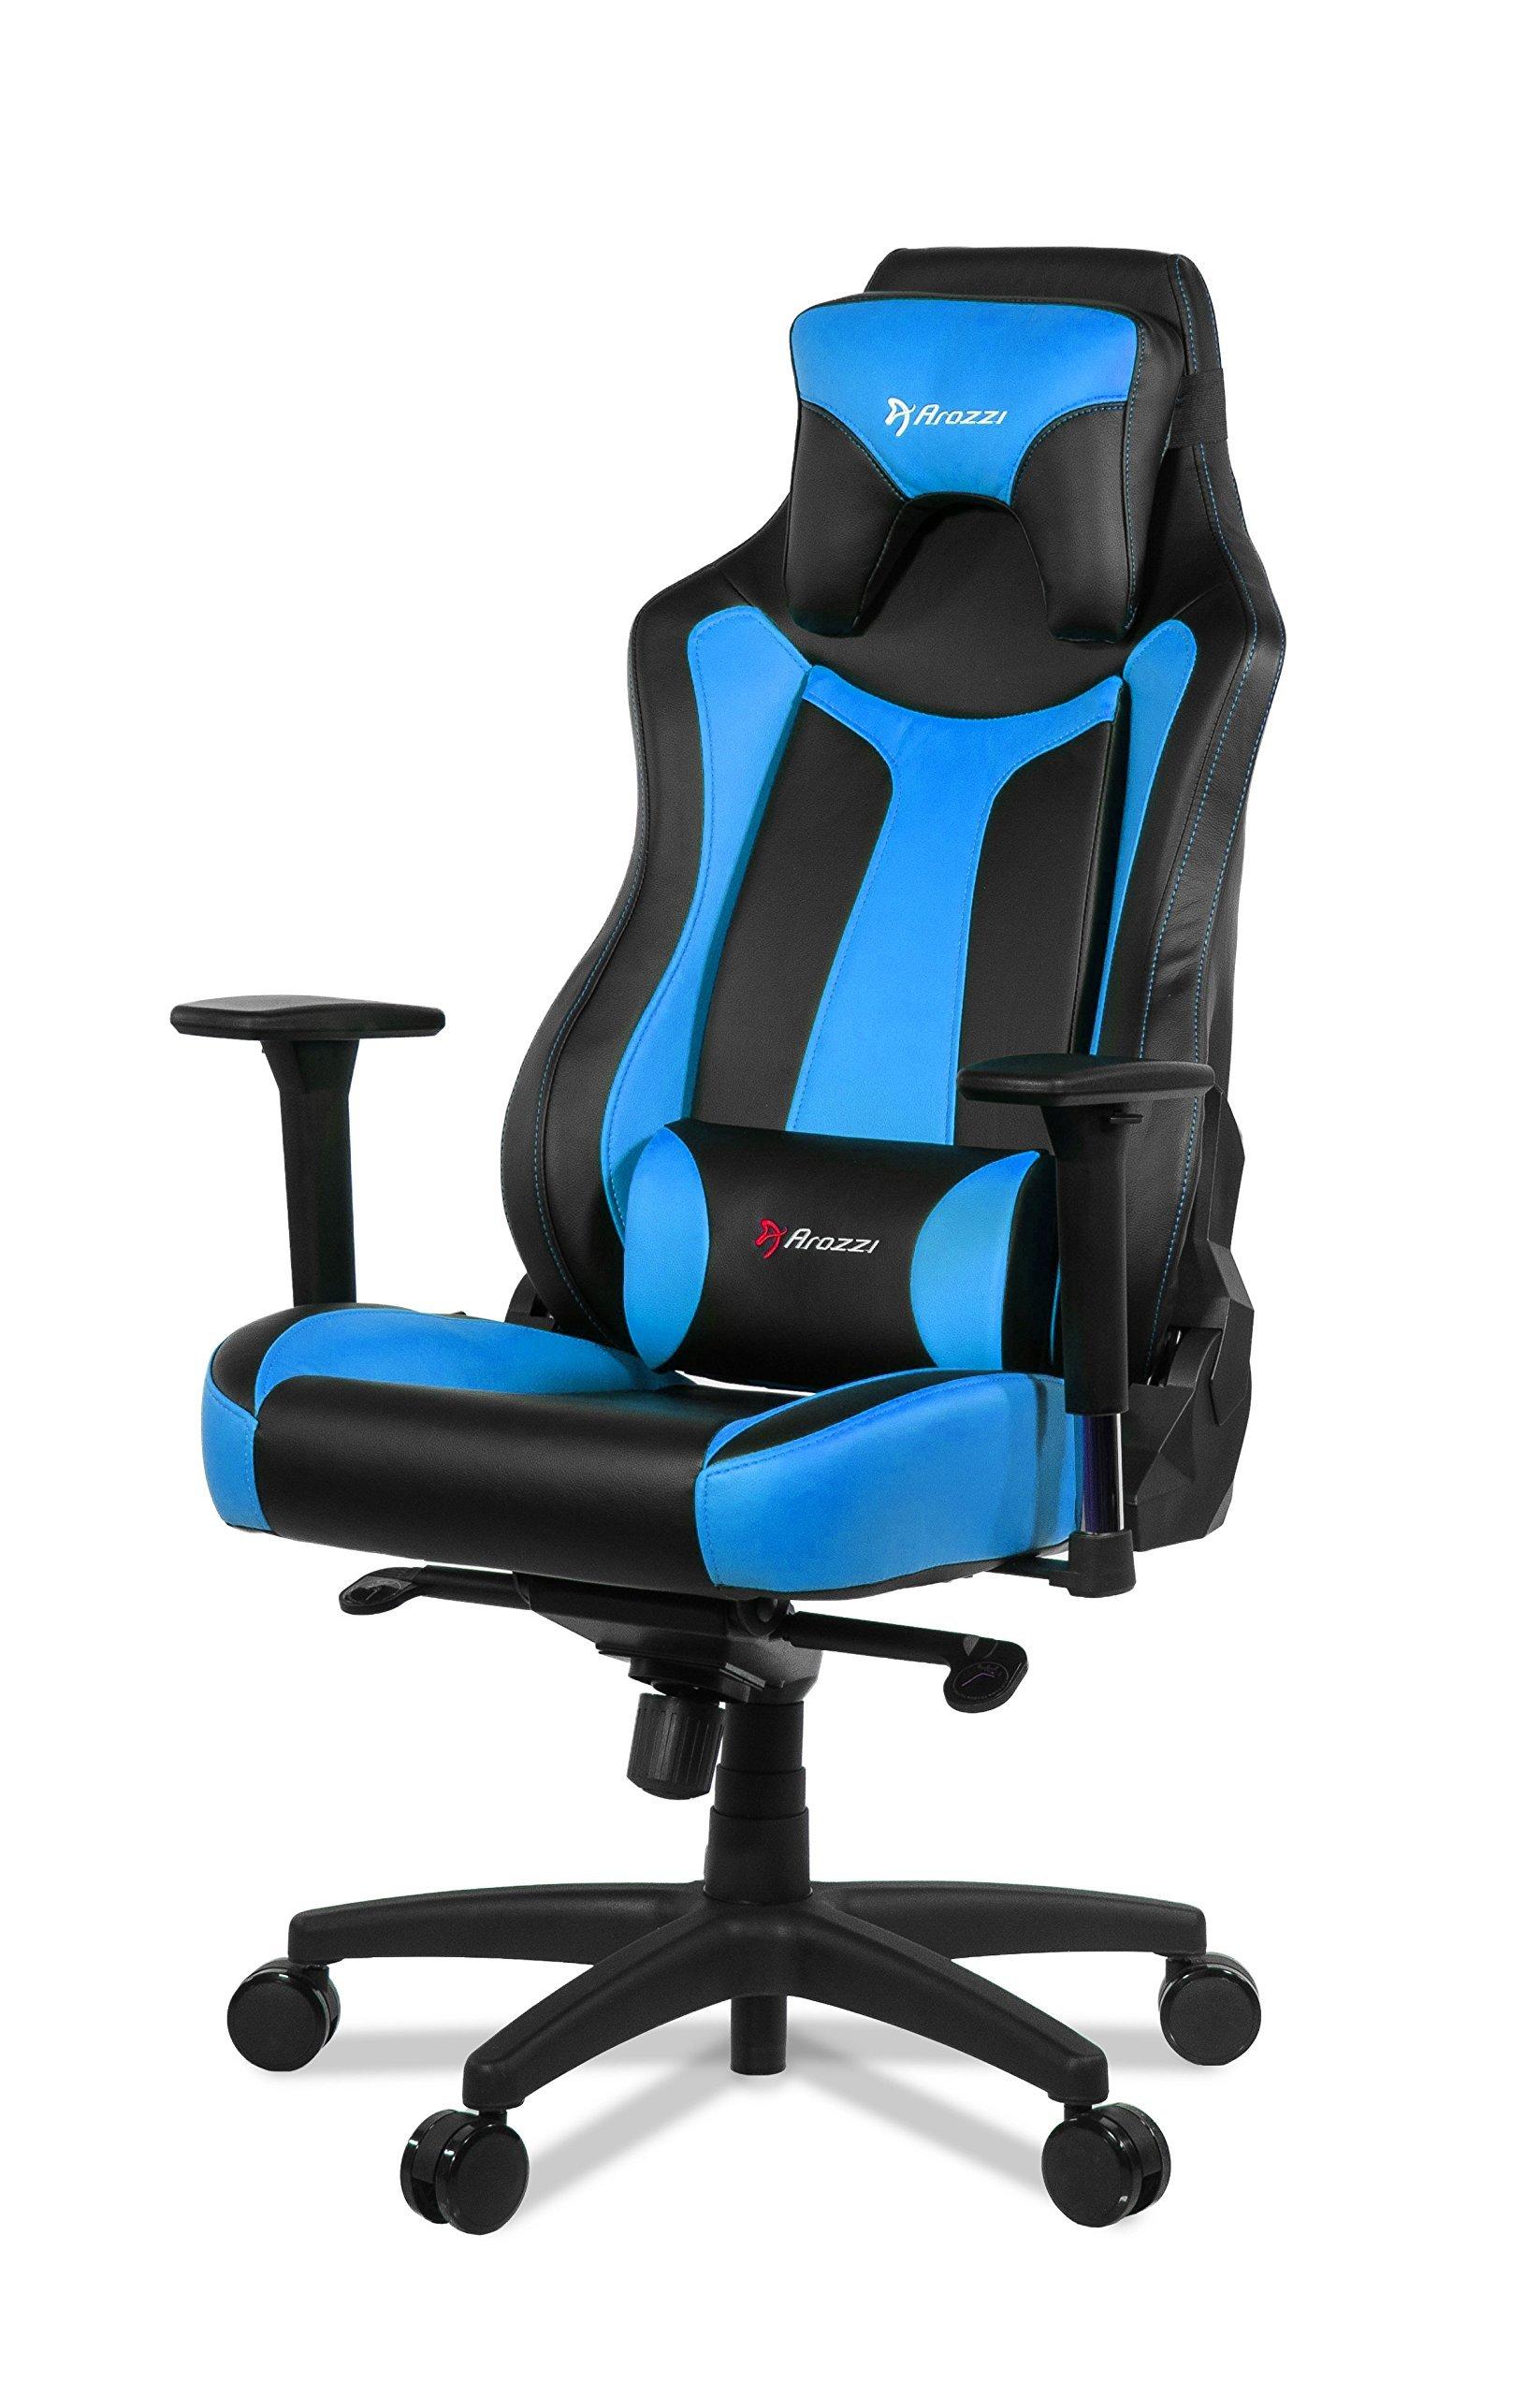 Arozzi – Silla Vernazza para Gamer – Silla giratoria y con Base de Ruedas en Color Azul y Negro para Gamer